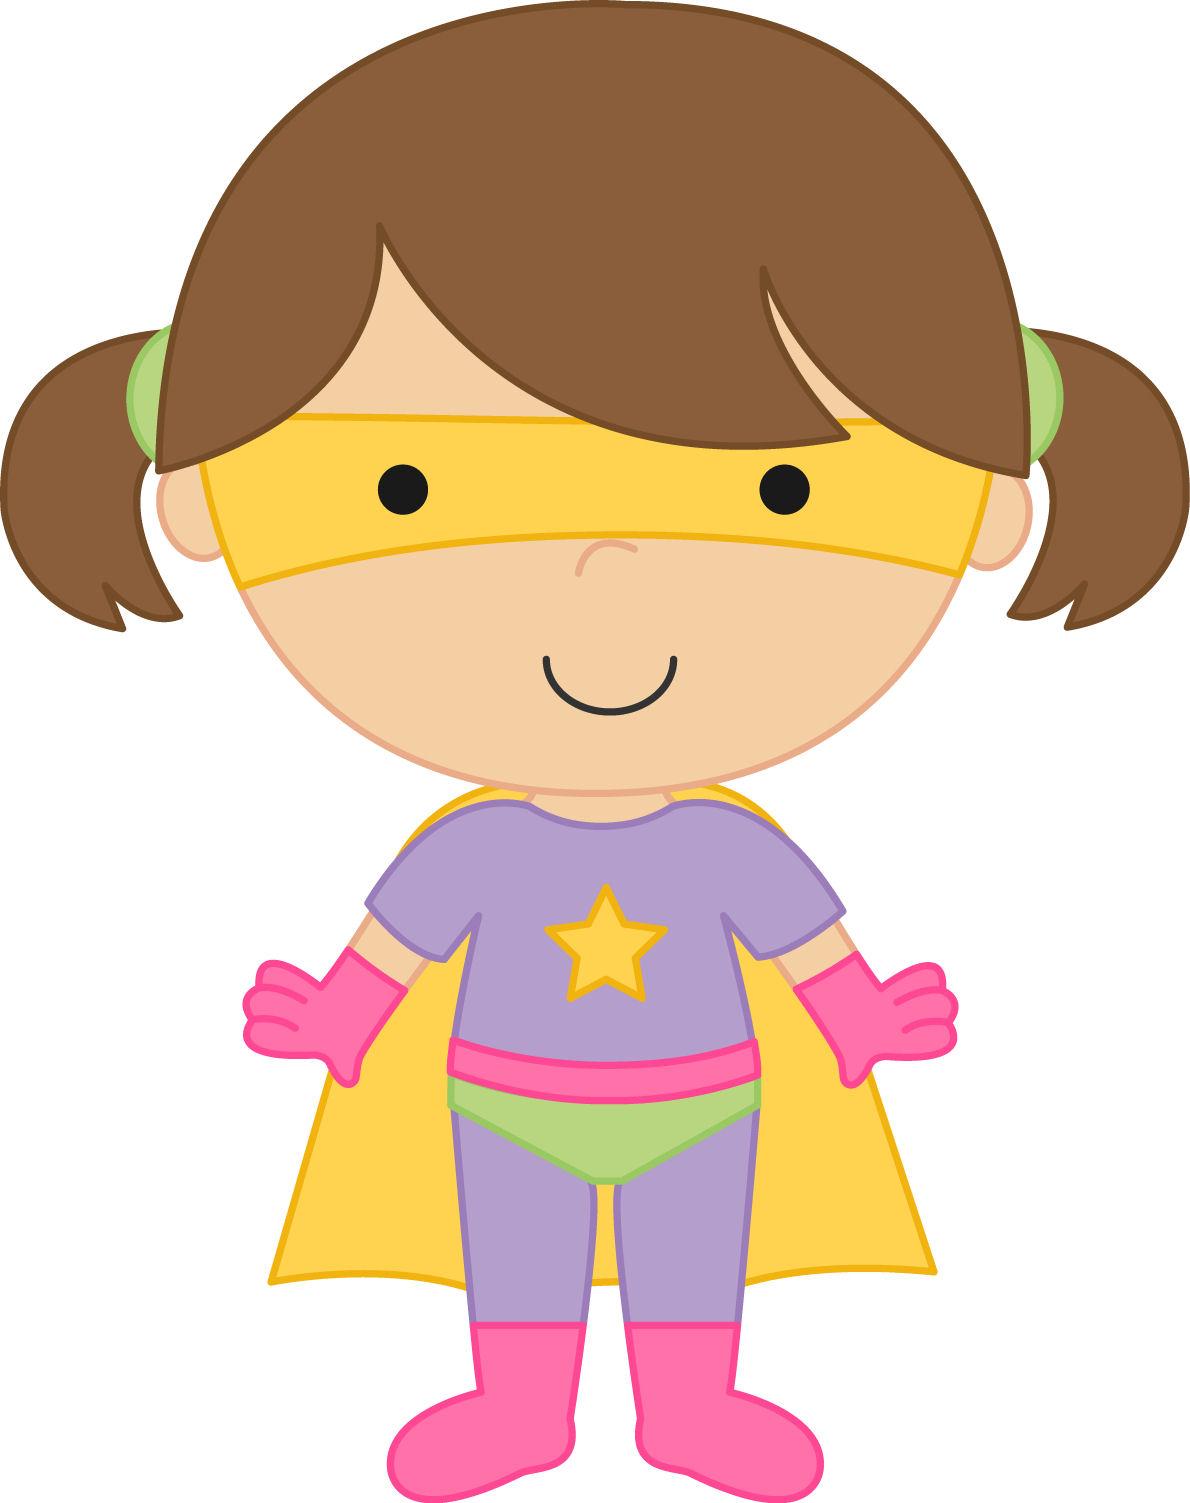 Supergirl clipart Clipart kid Super 2 girl